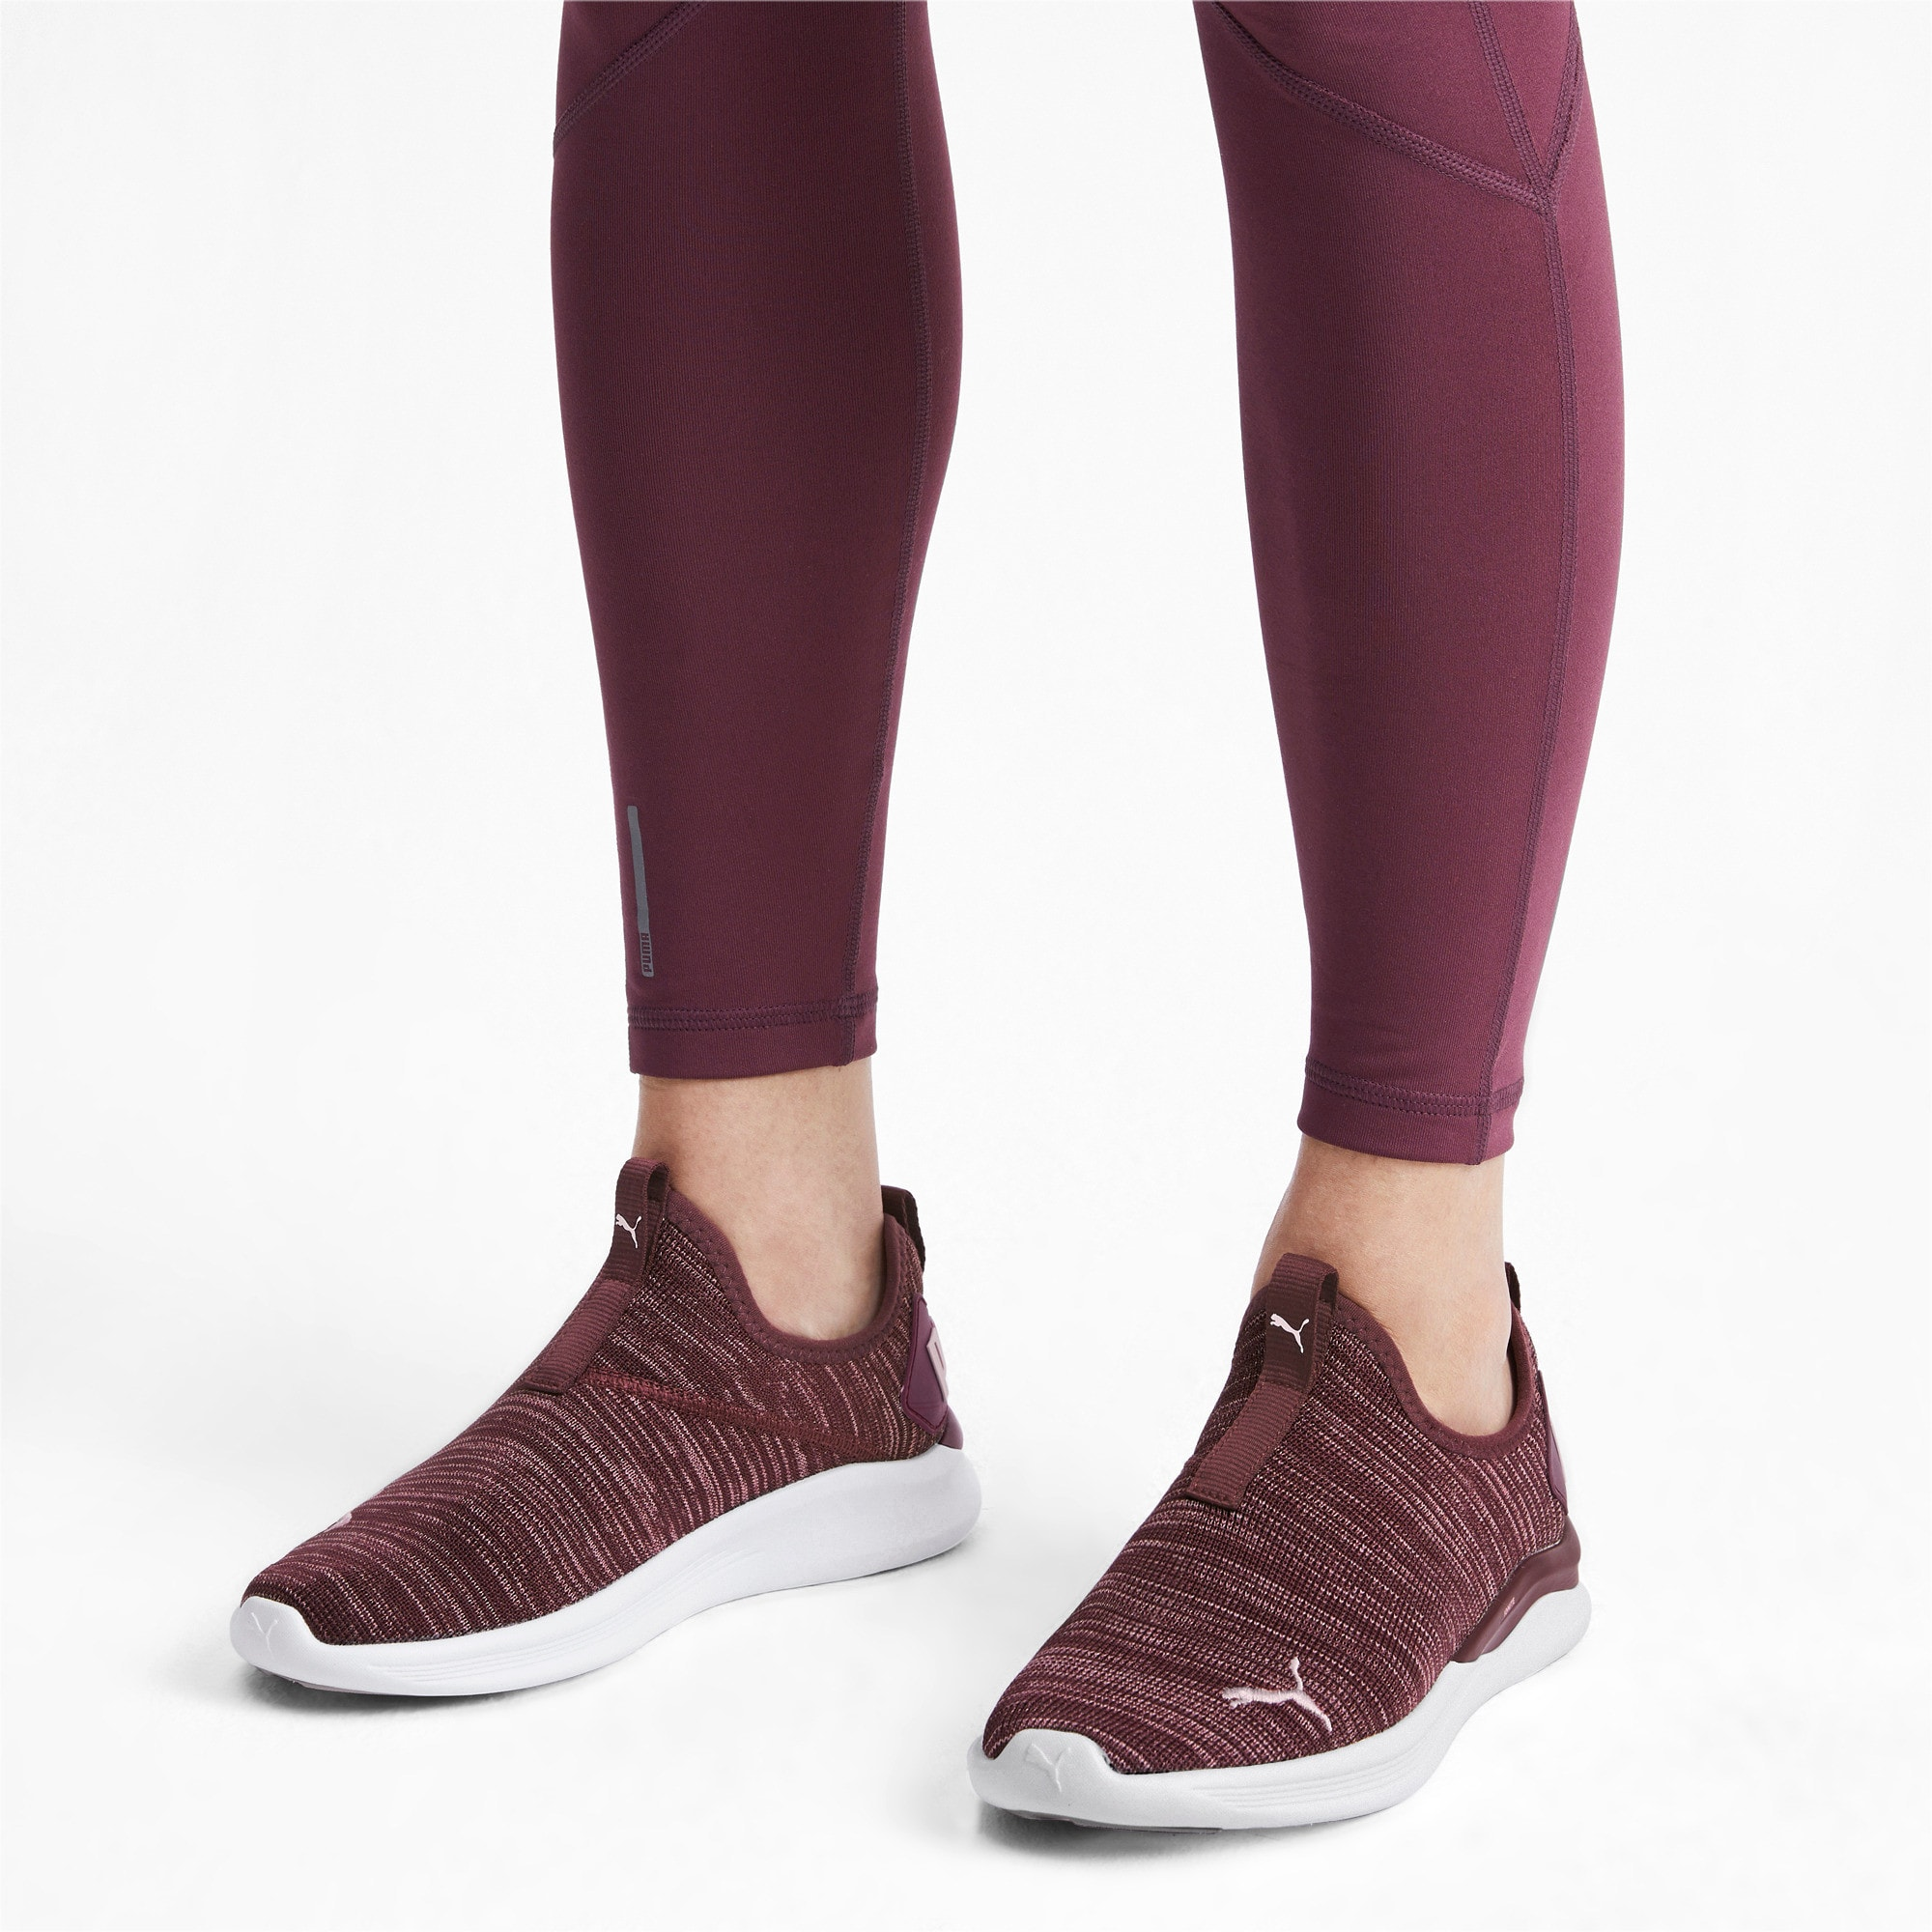 Thumbnail 3 of IGNITE Flash Summer Slip Women's Training Shoes, Vineyard Wine-Bridal Rose, medium